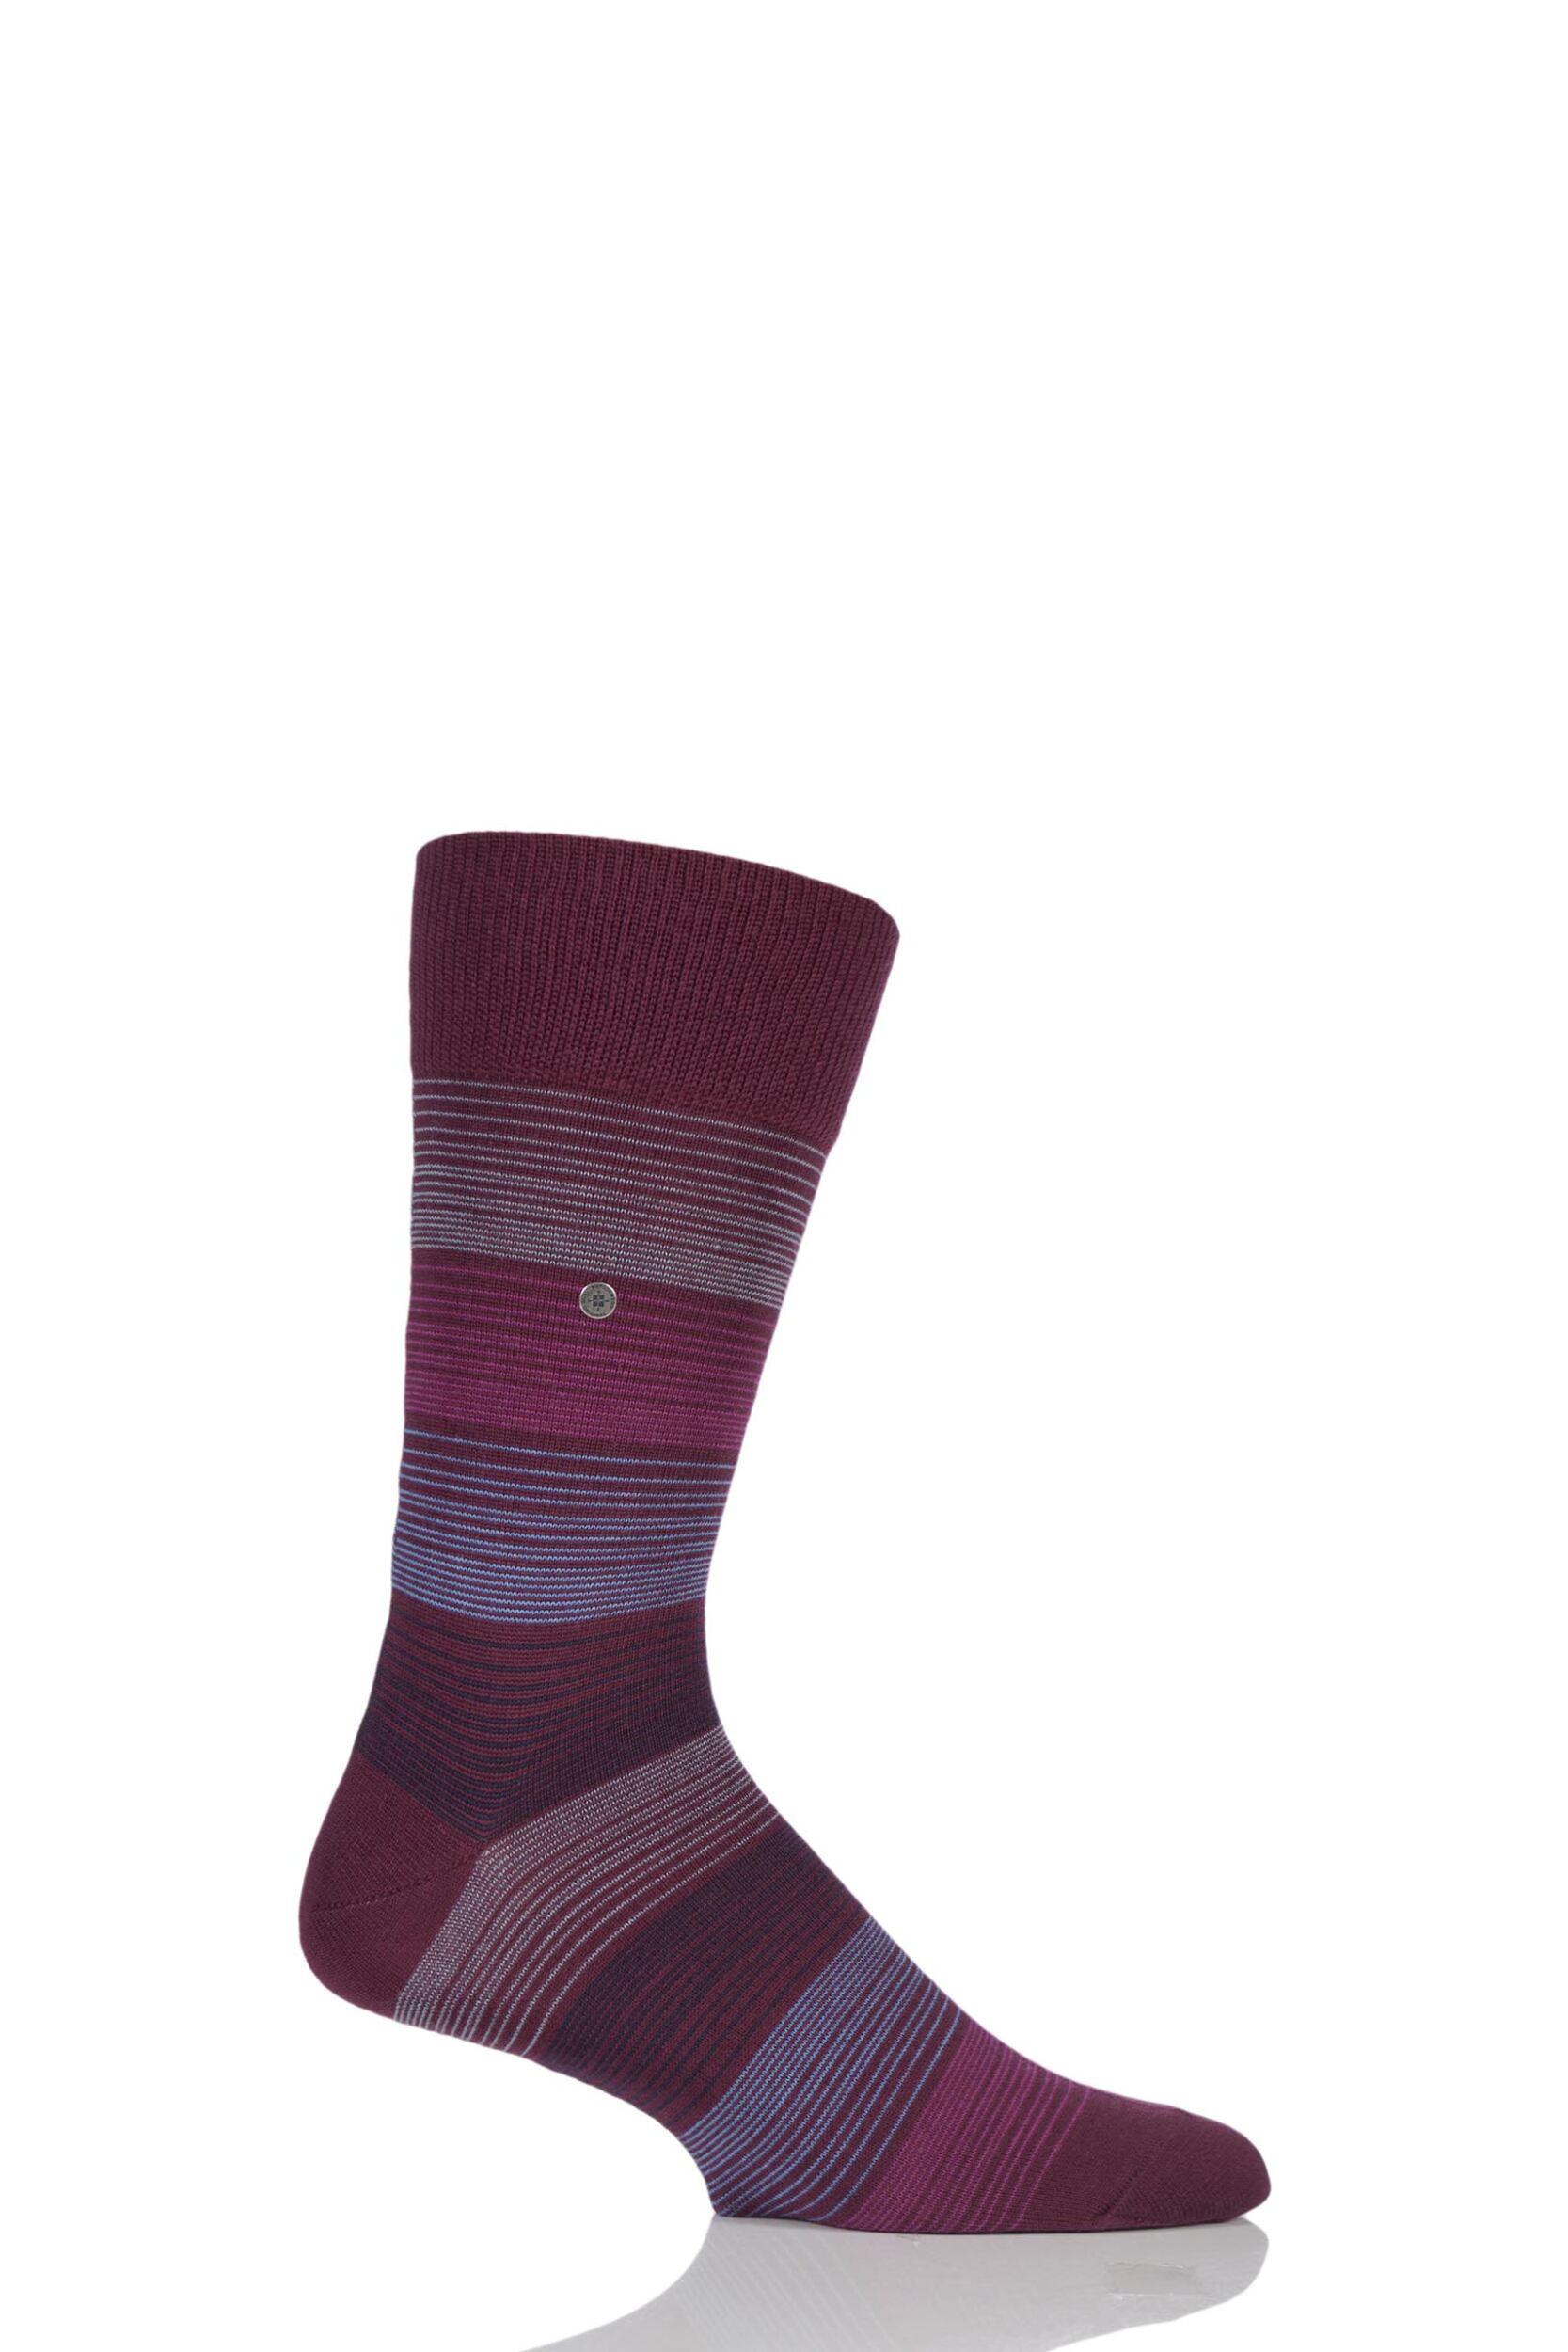 Mens 1 Pair Burlington Prism Fine Stripe Cotton Socks